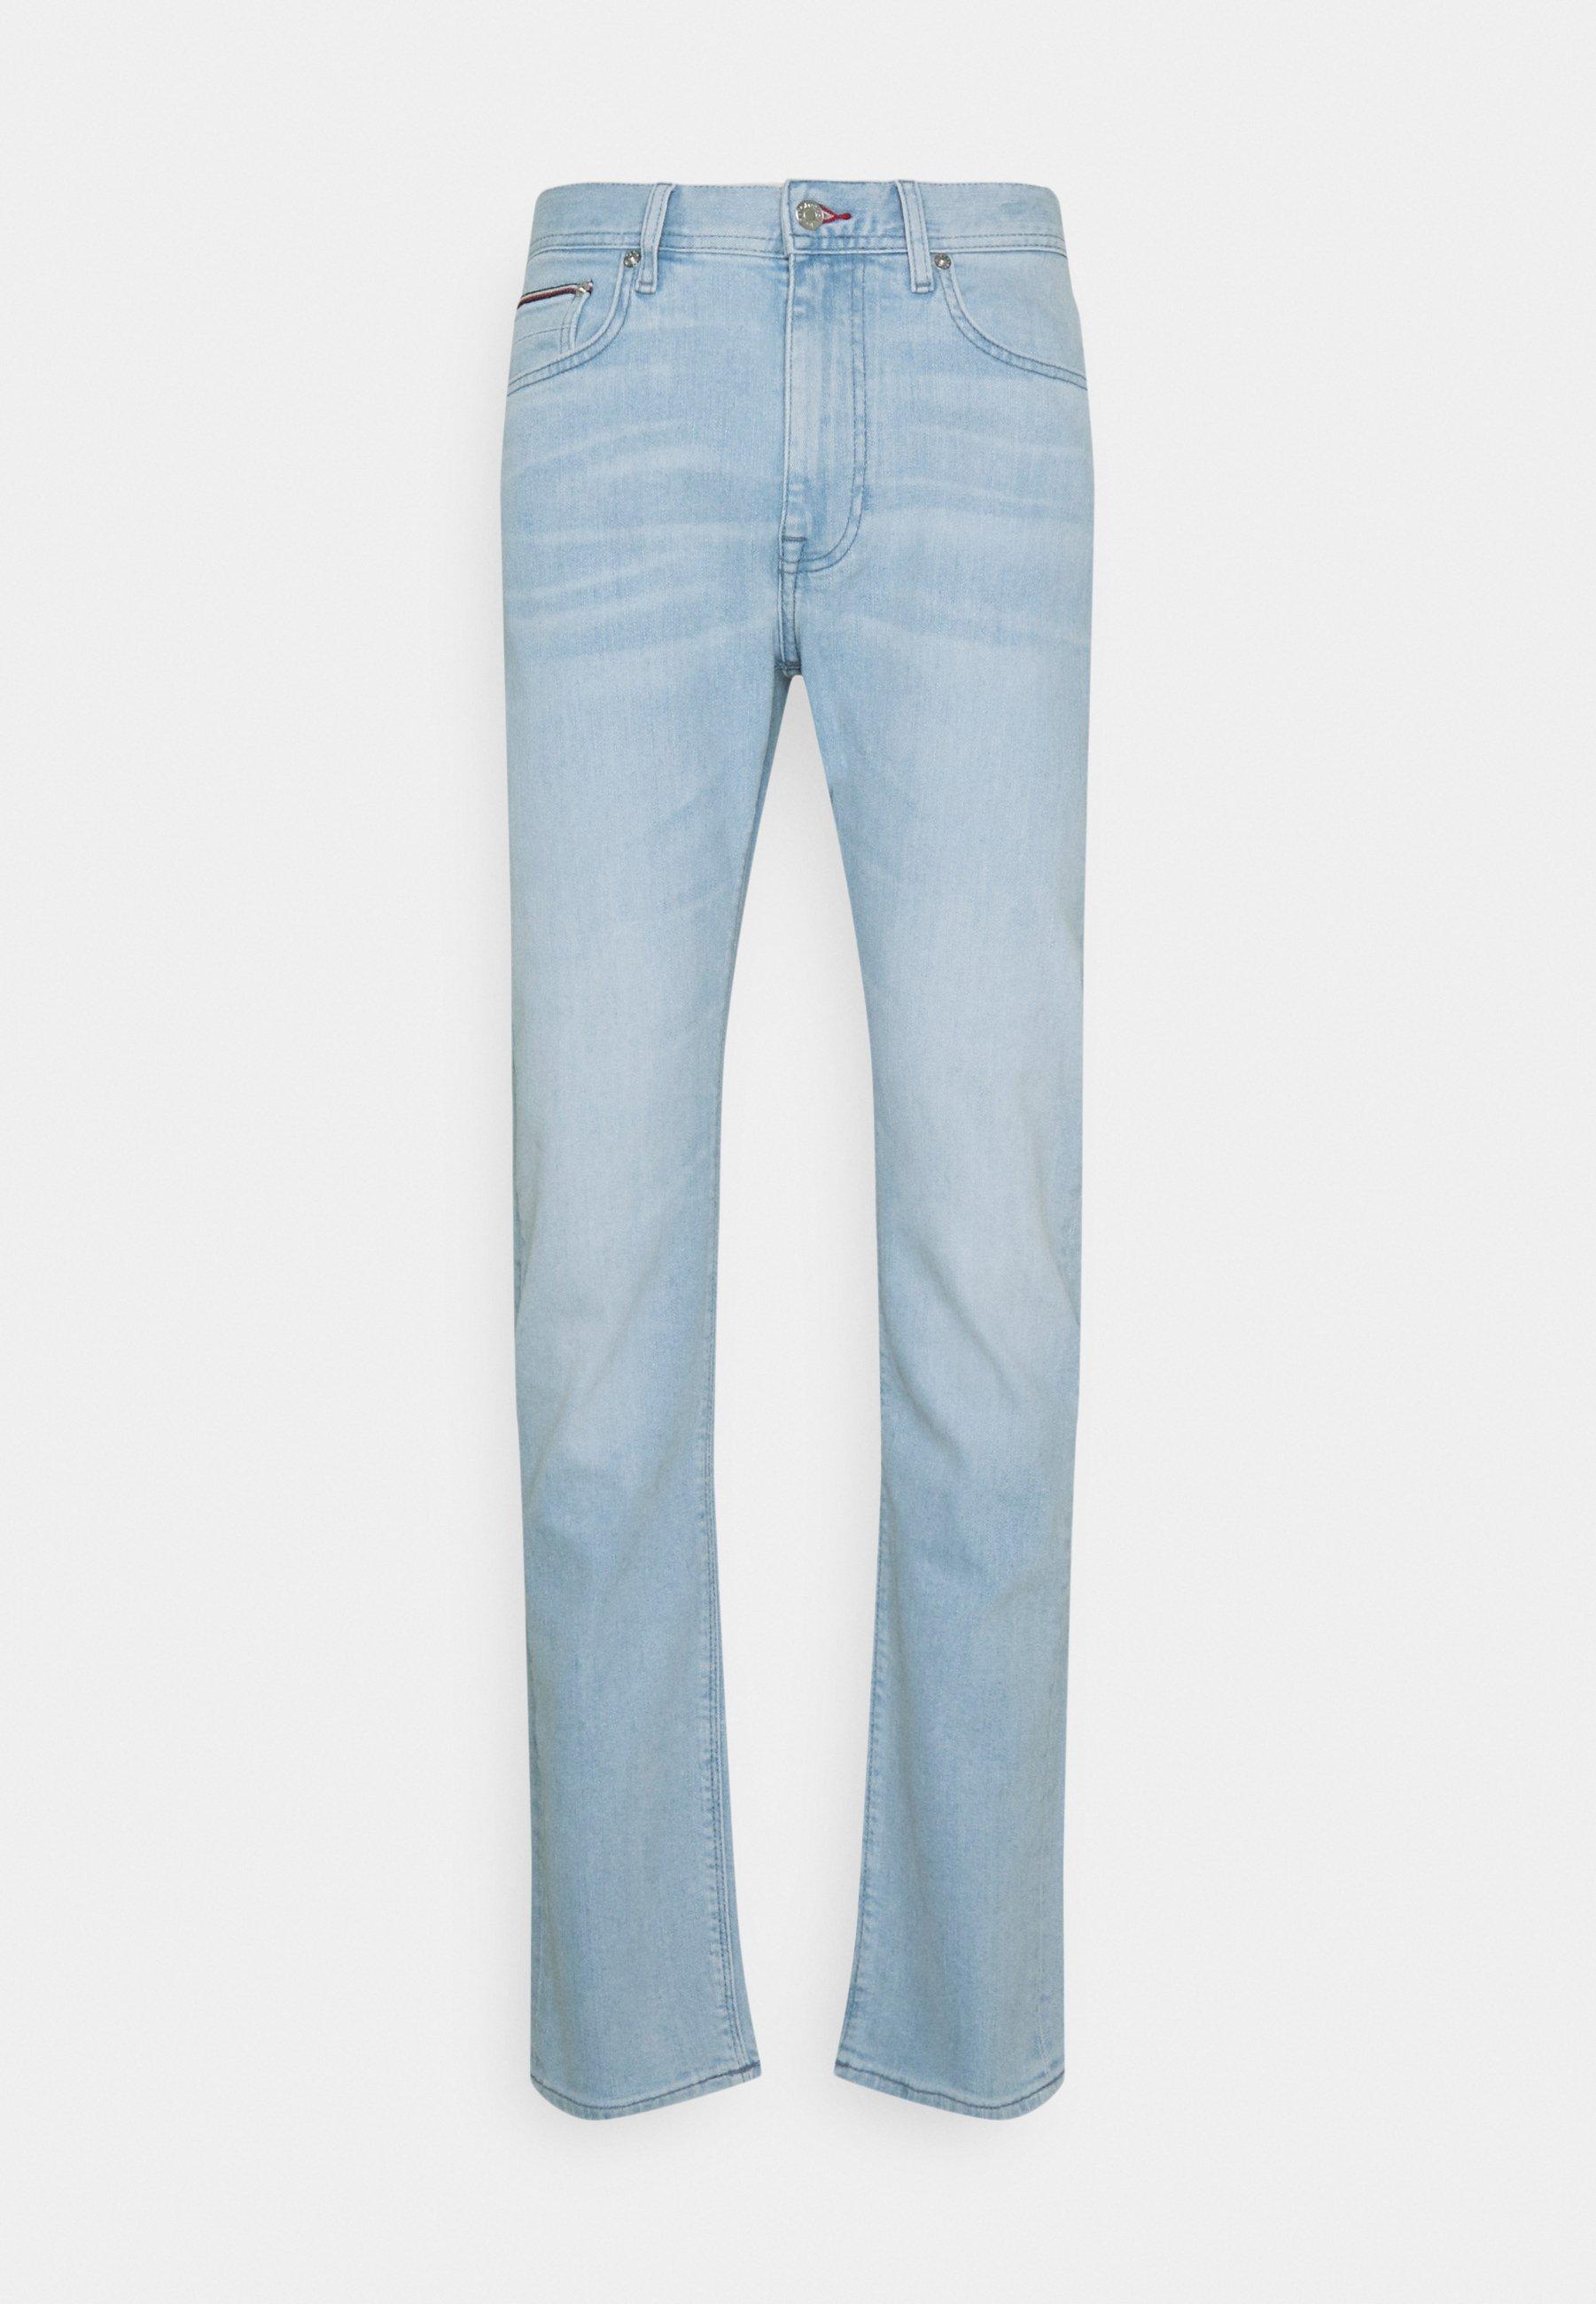 Uomo SLIM BLEECKER - Jeans slim fit